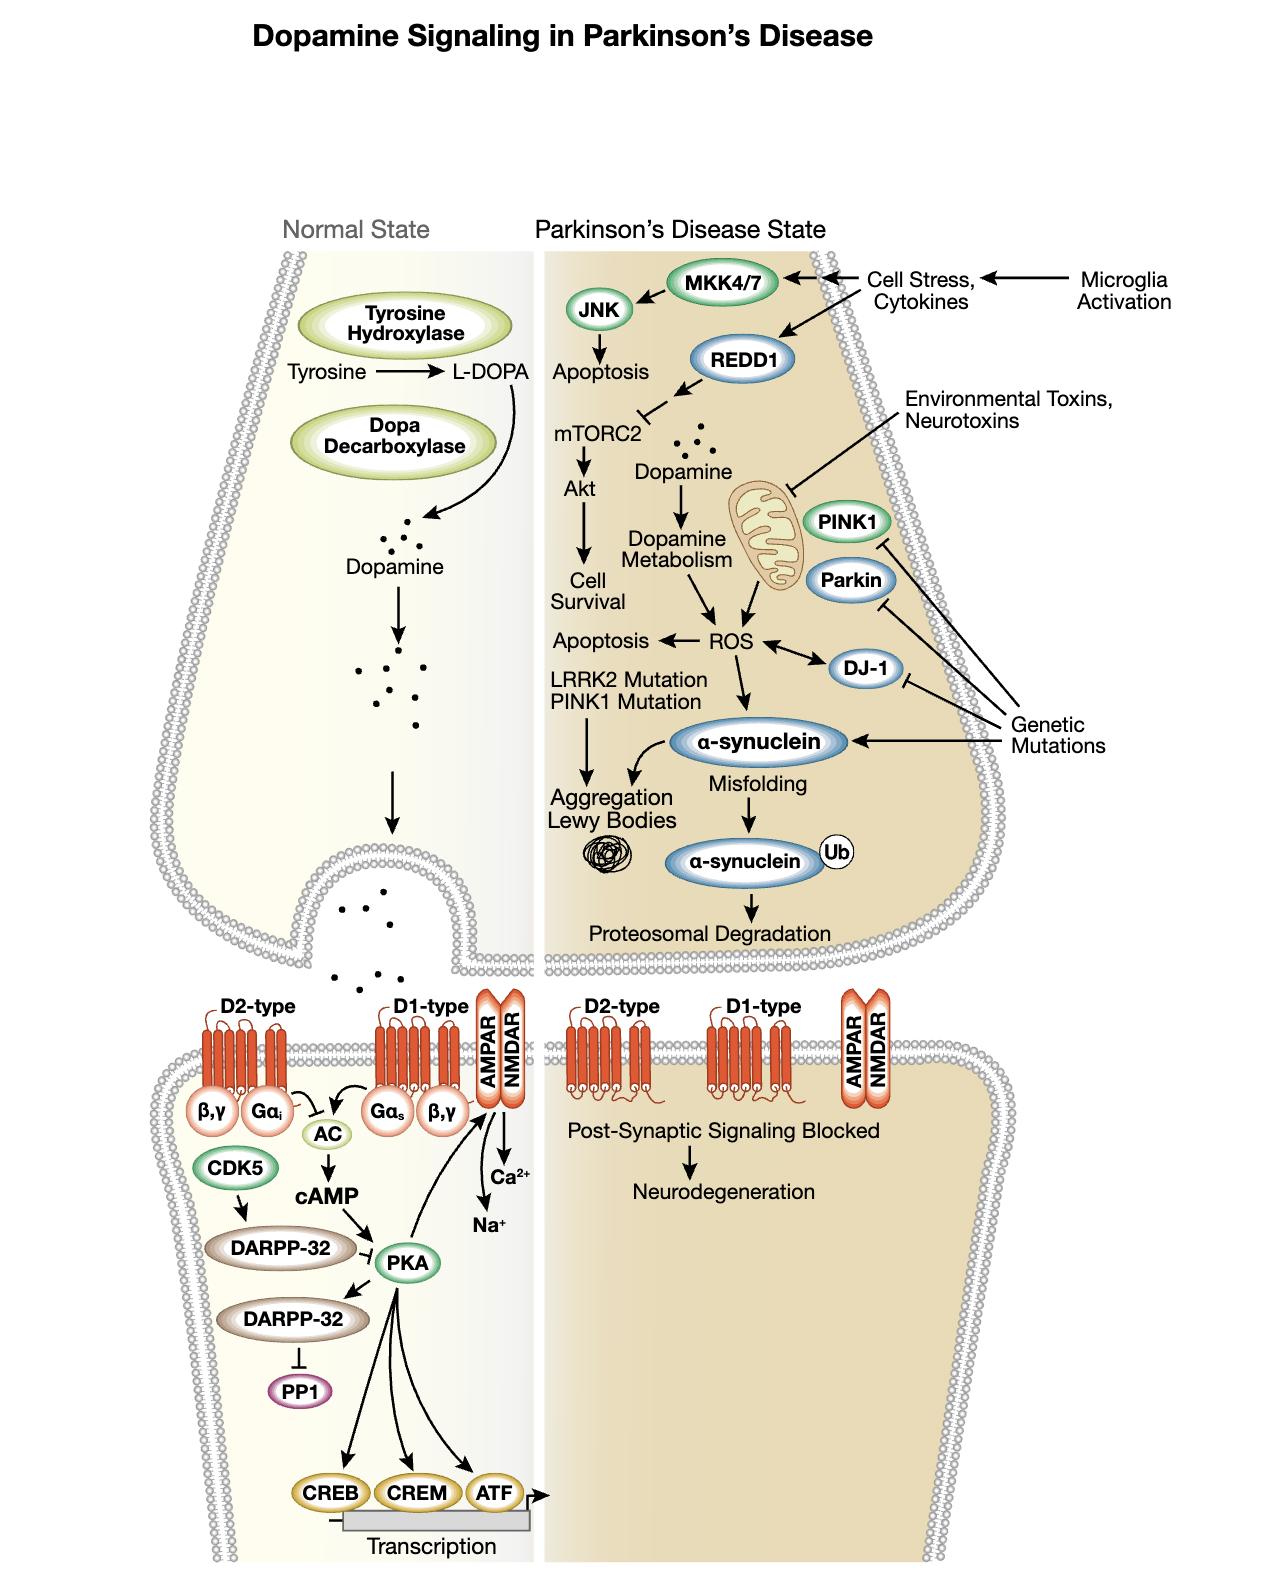 Dopamine Interactive Signaling Pathway